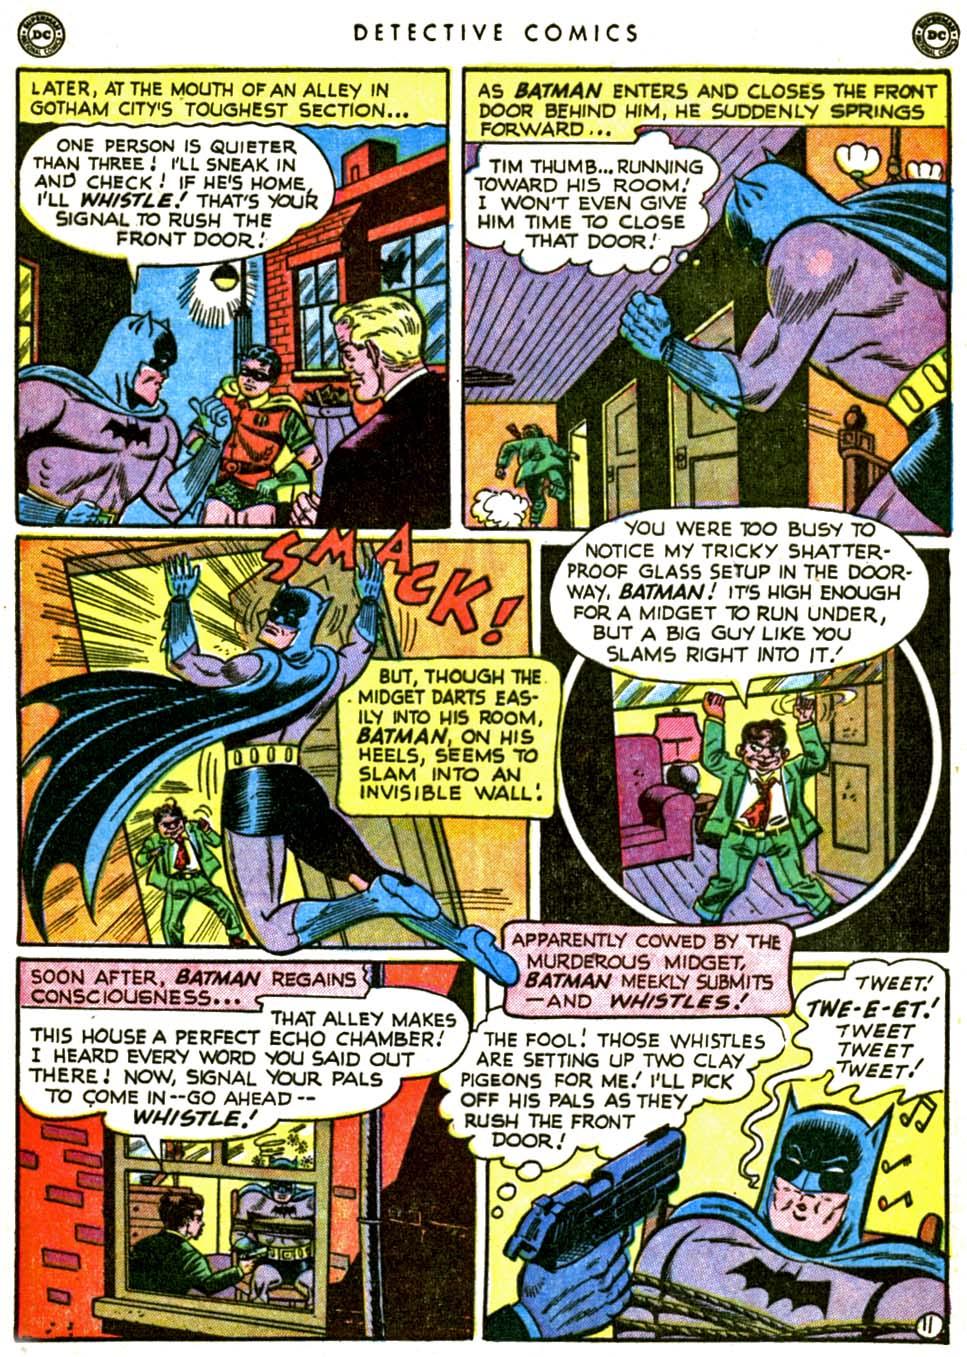 Read online Detective Comics (1937) comic -  Issue #162 - 13